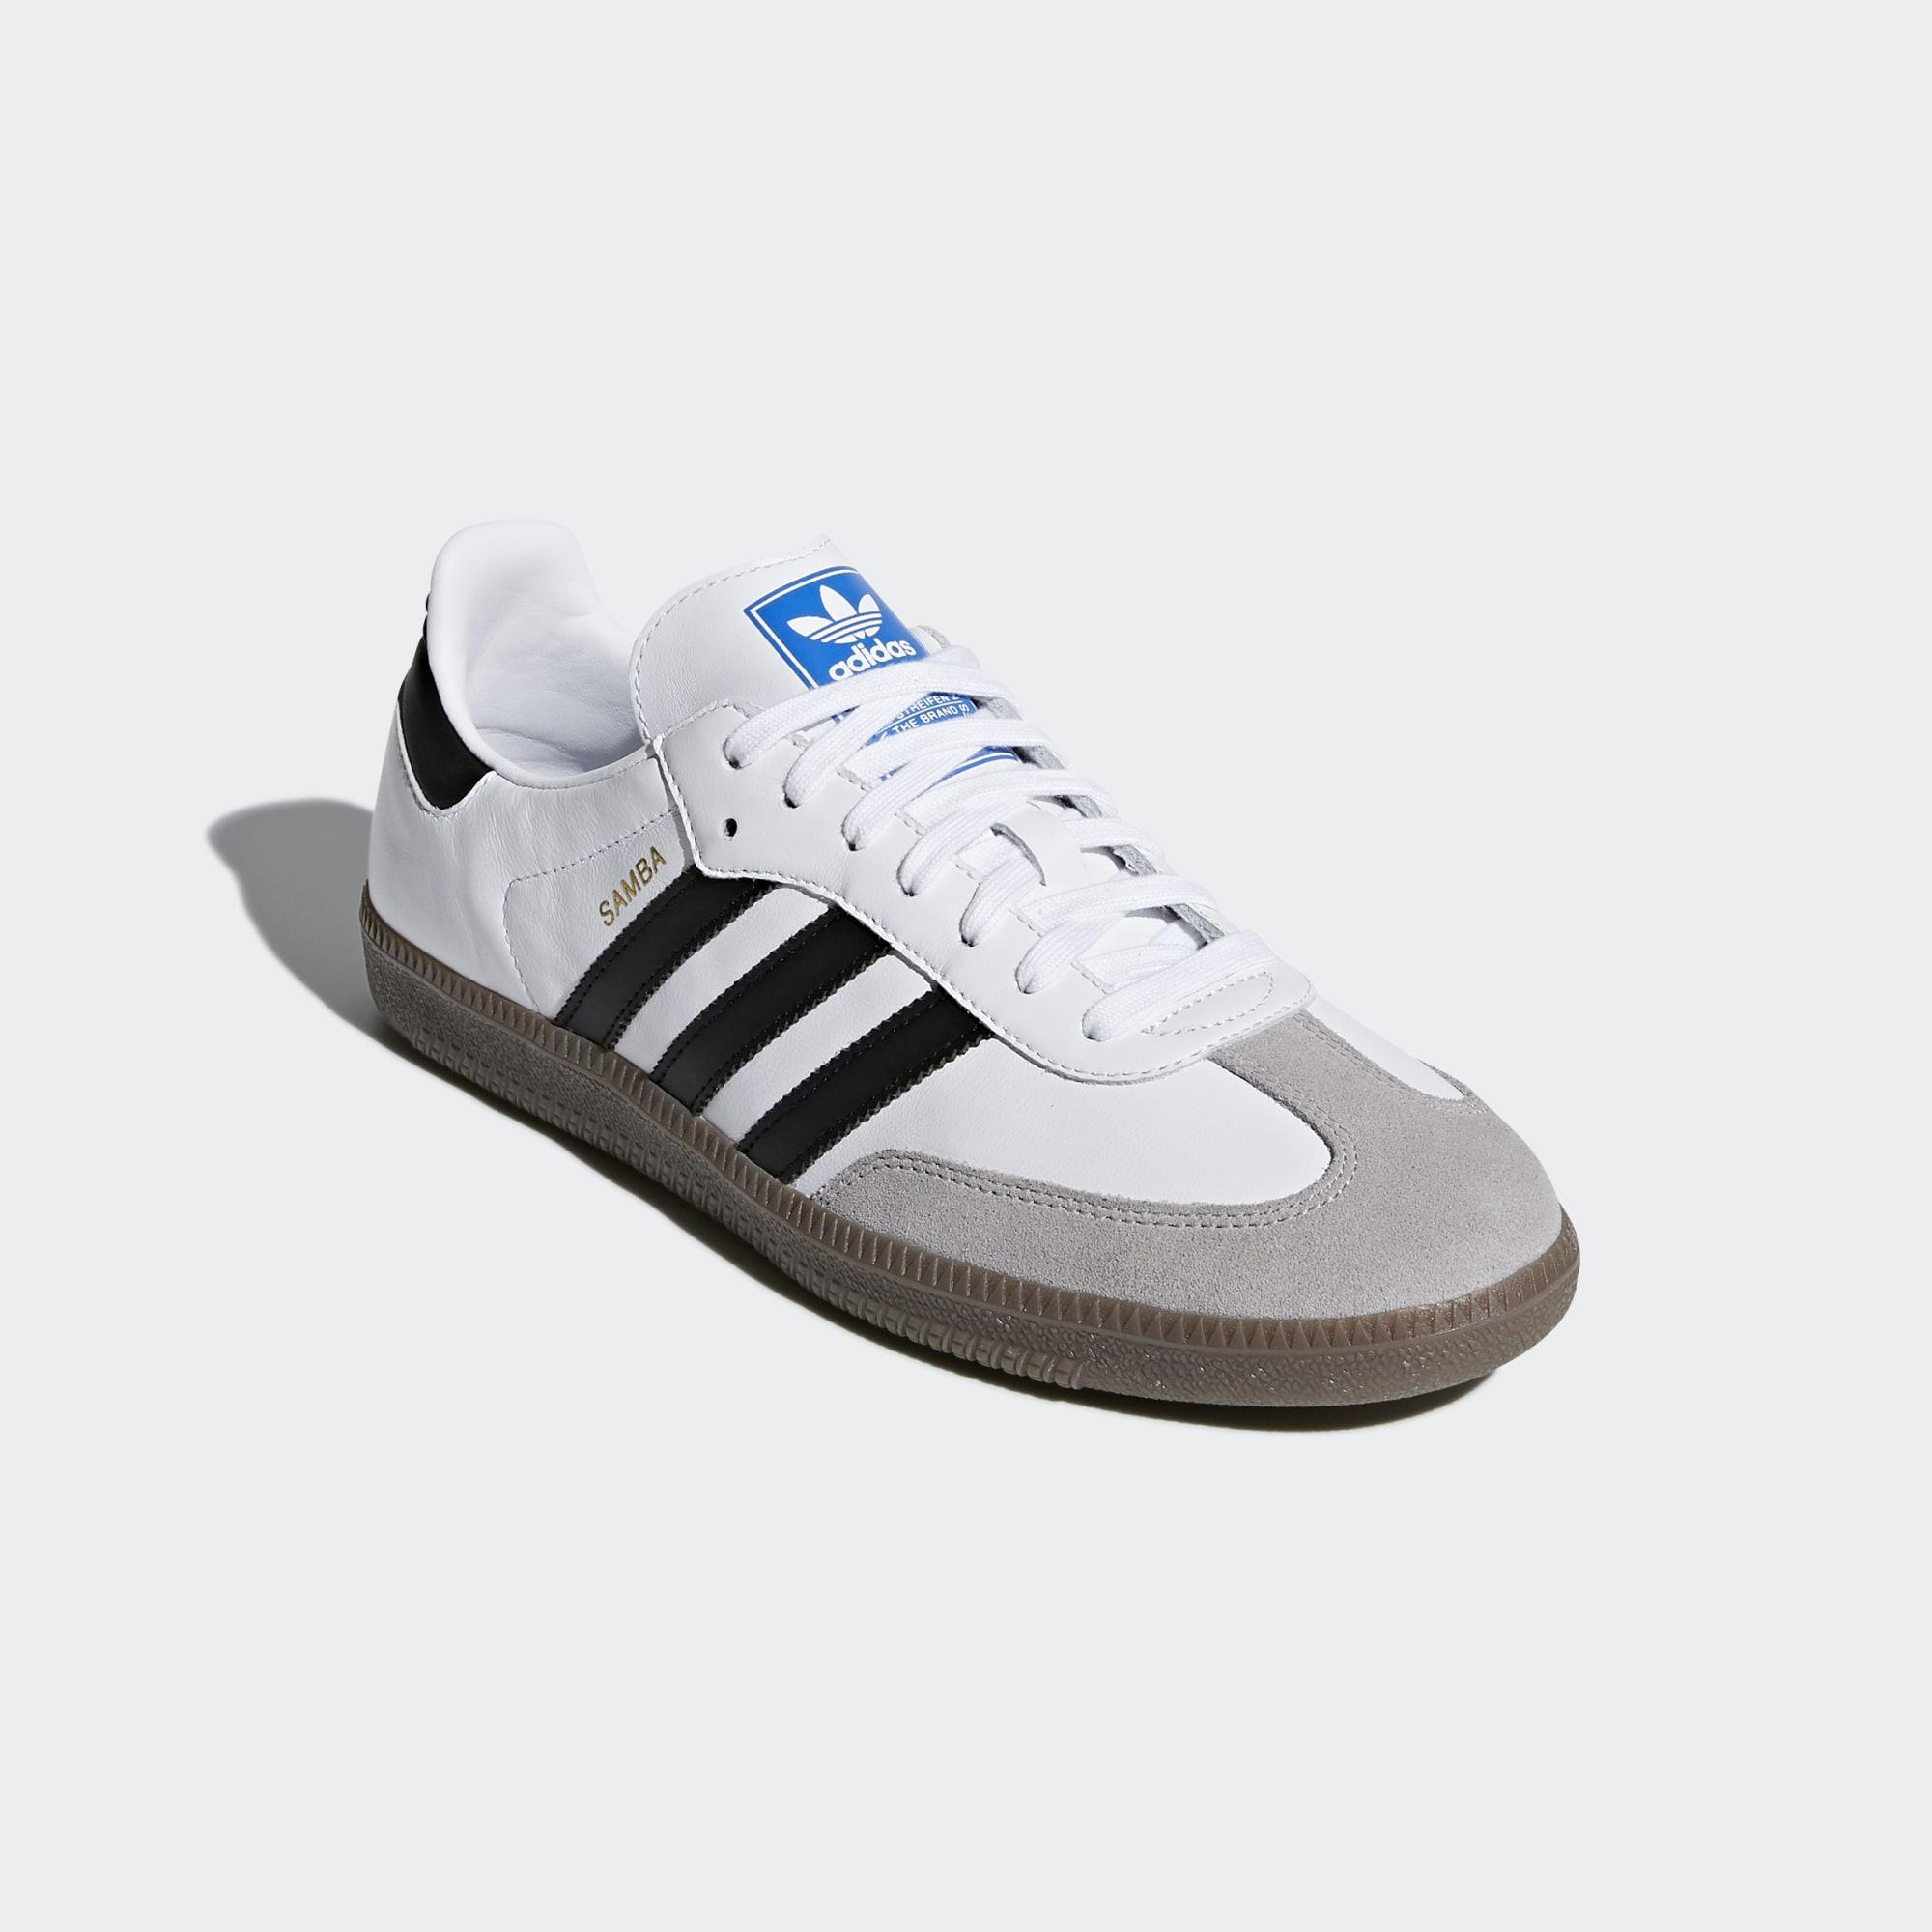 5. kép: ADIDAS sneaker